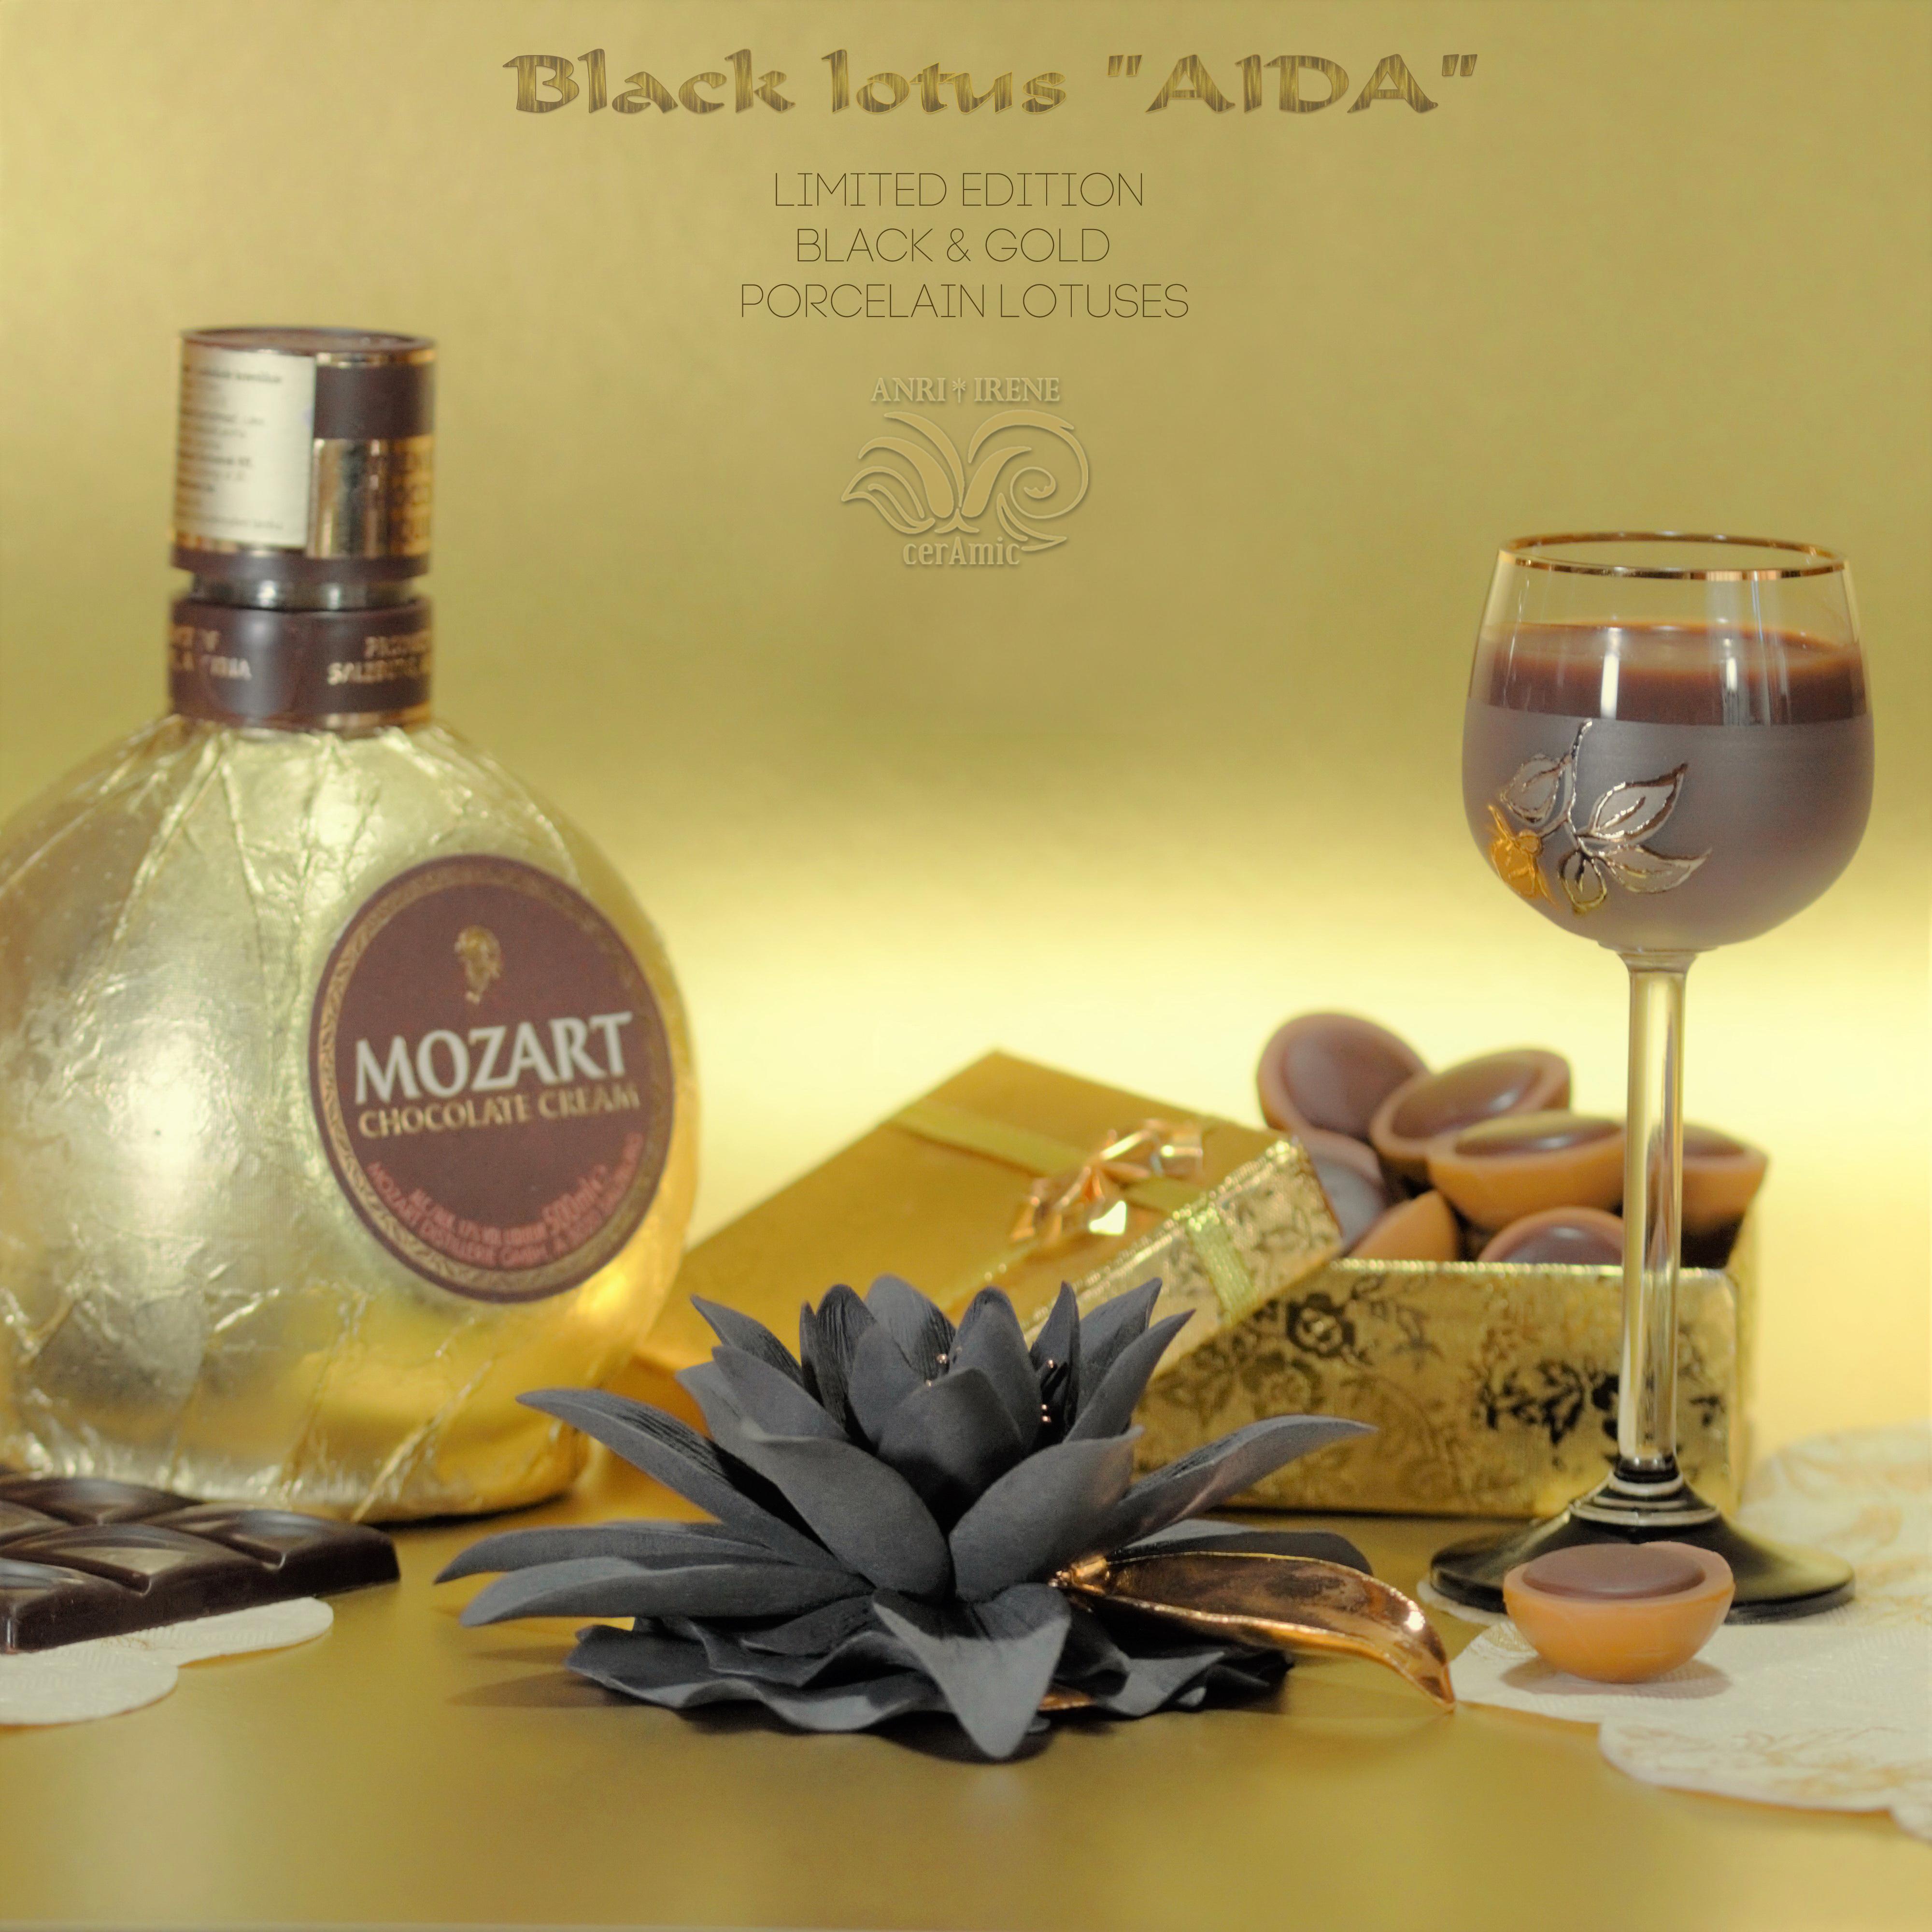 Porcelain black lotus